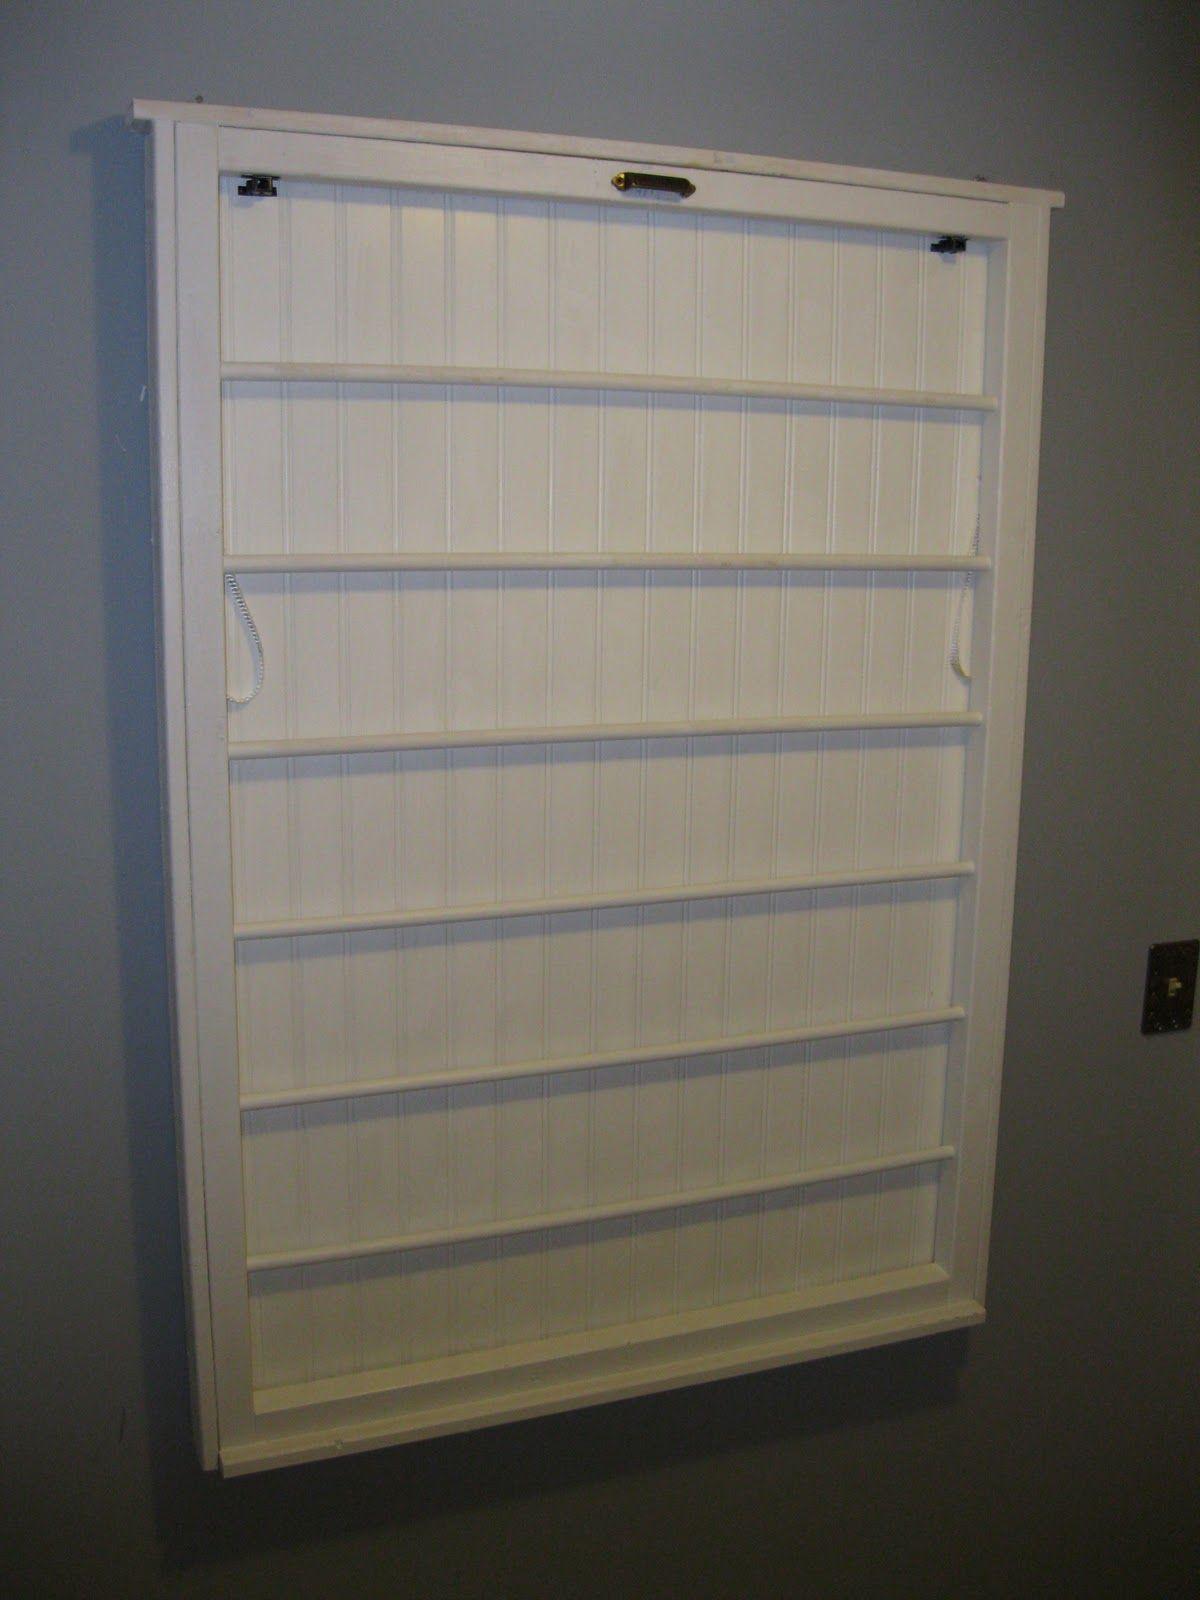 Ballard Designs Inspired Laundry Drying Rack Drying Rack Laundry